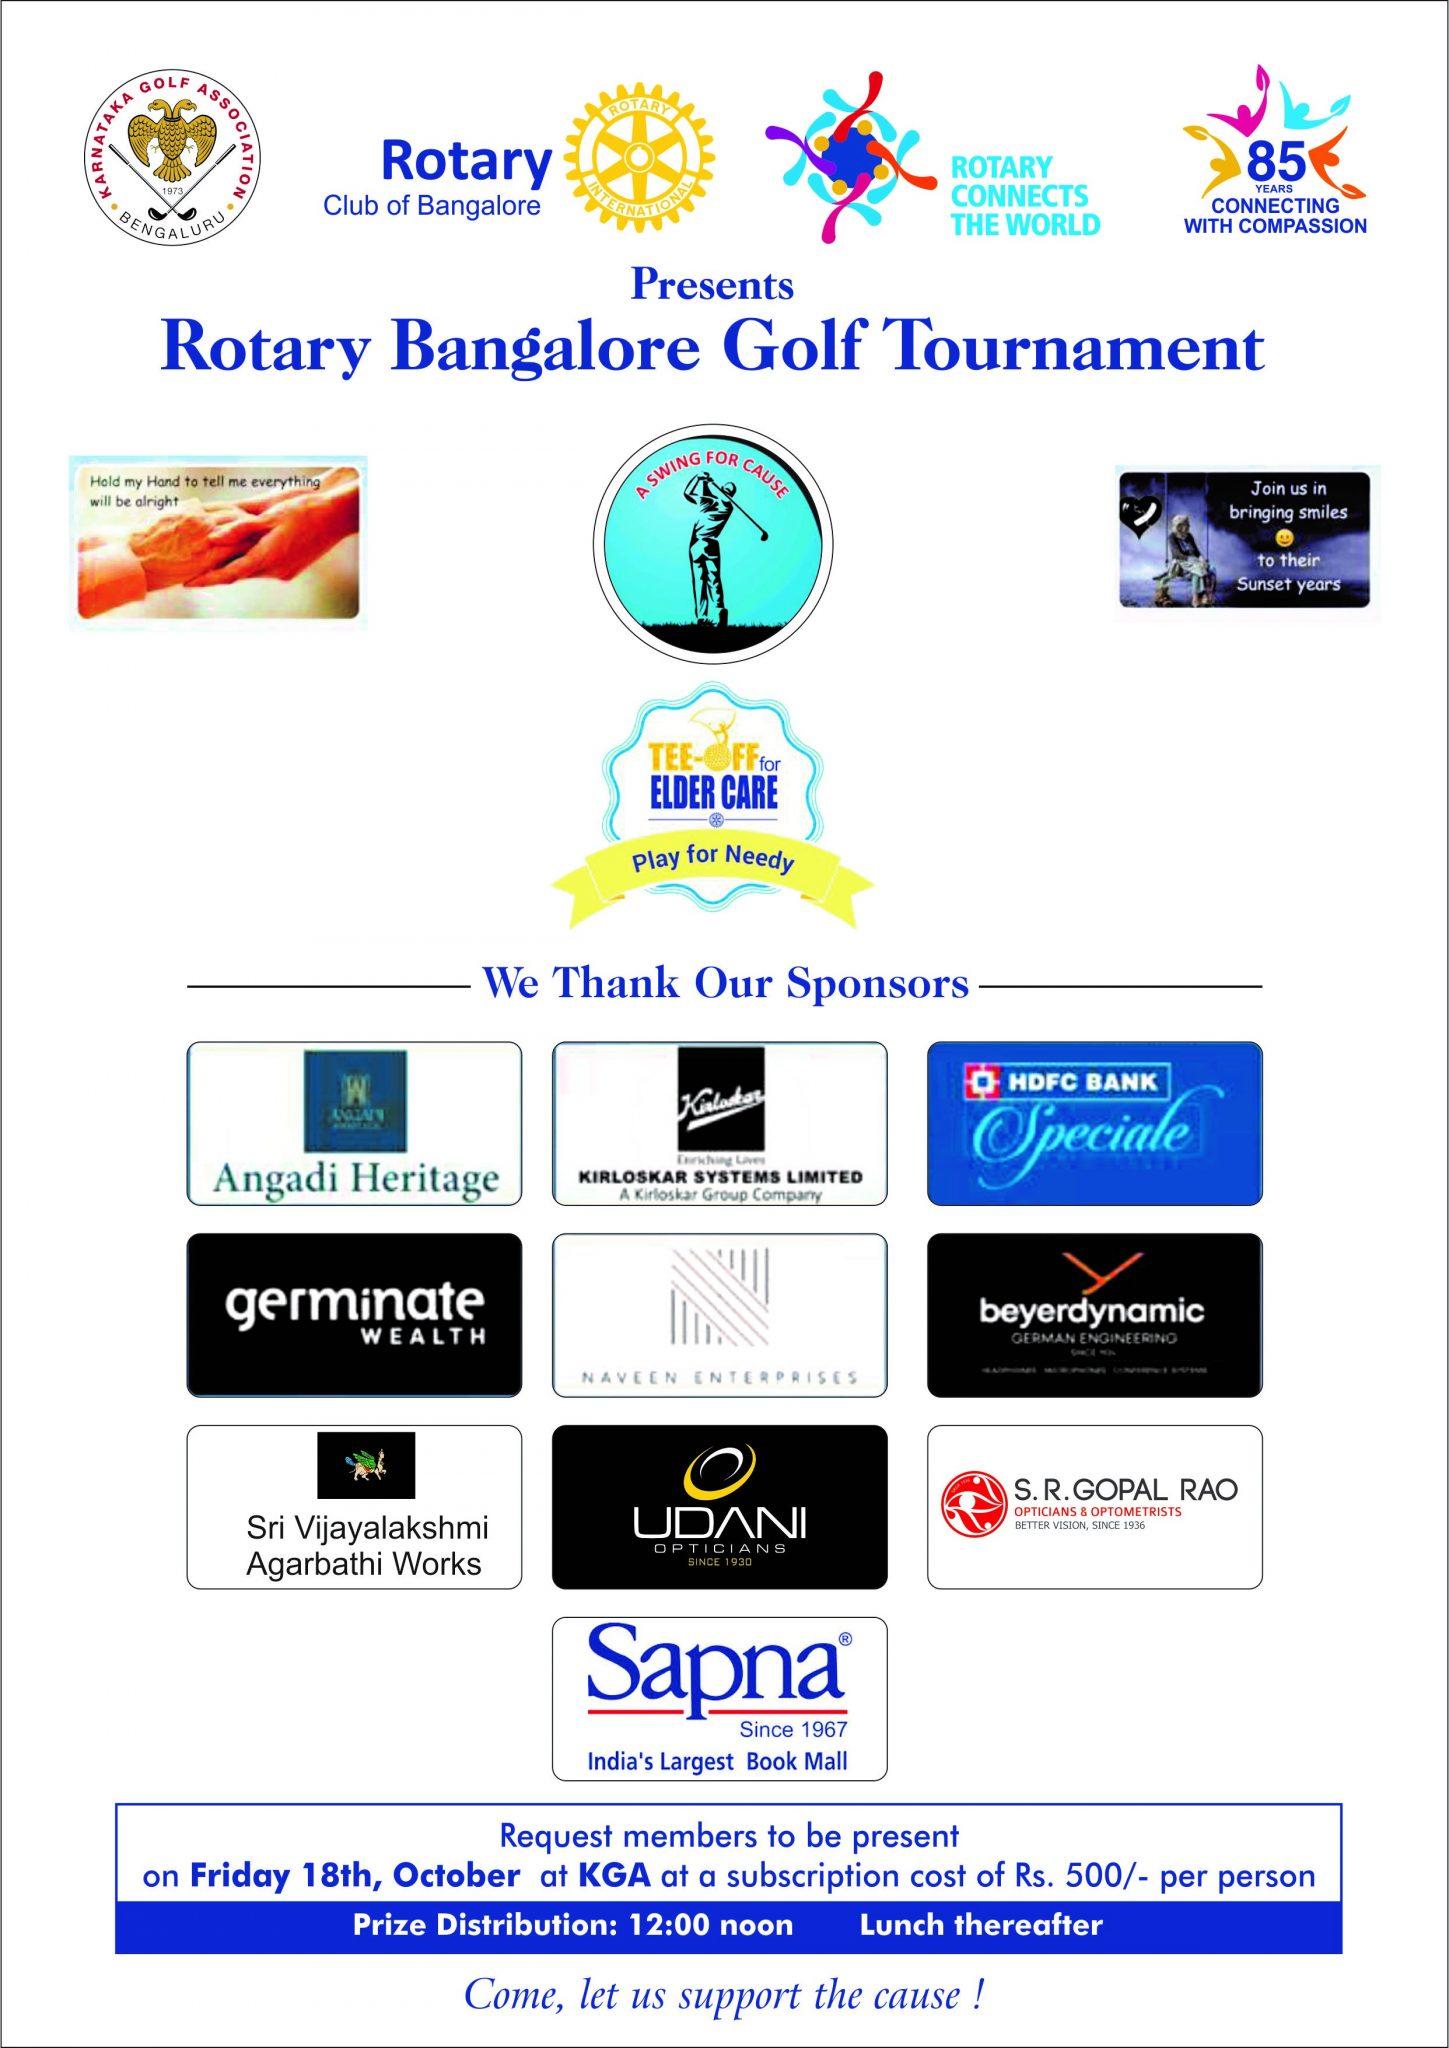 Rotary Bangalore Golf Tournament